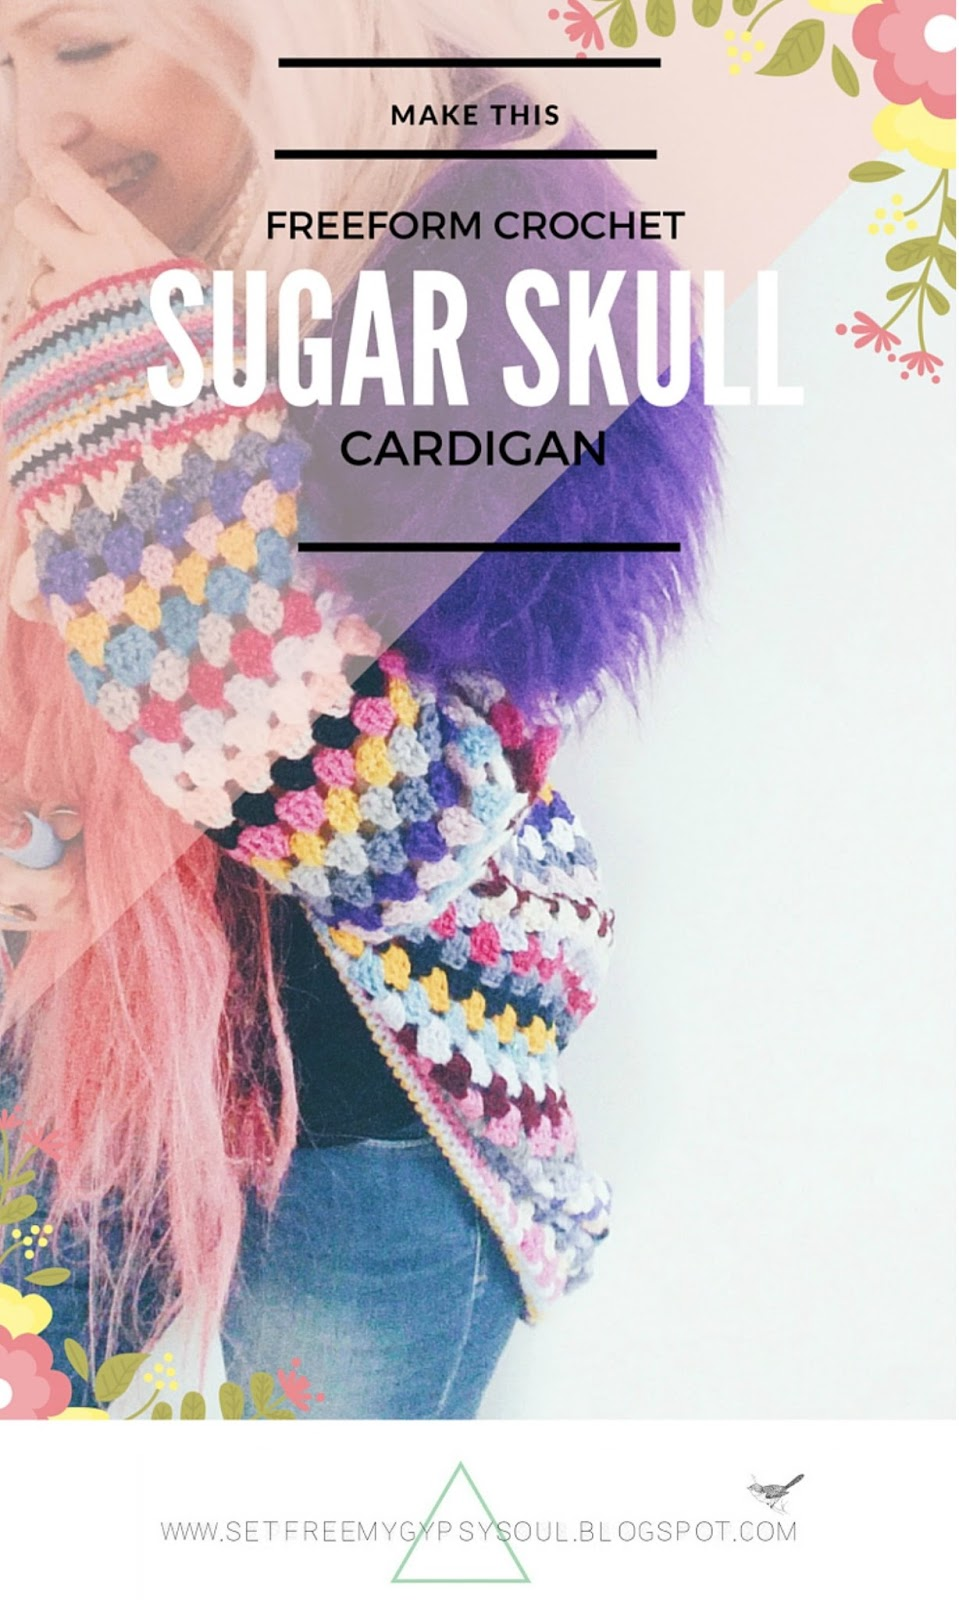 a5b2b070c7fd free freeform crochet sugar skull cardigan pattern